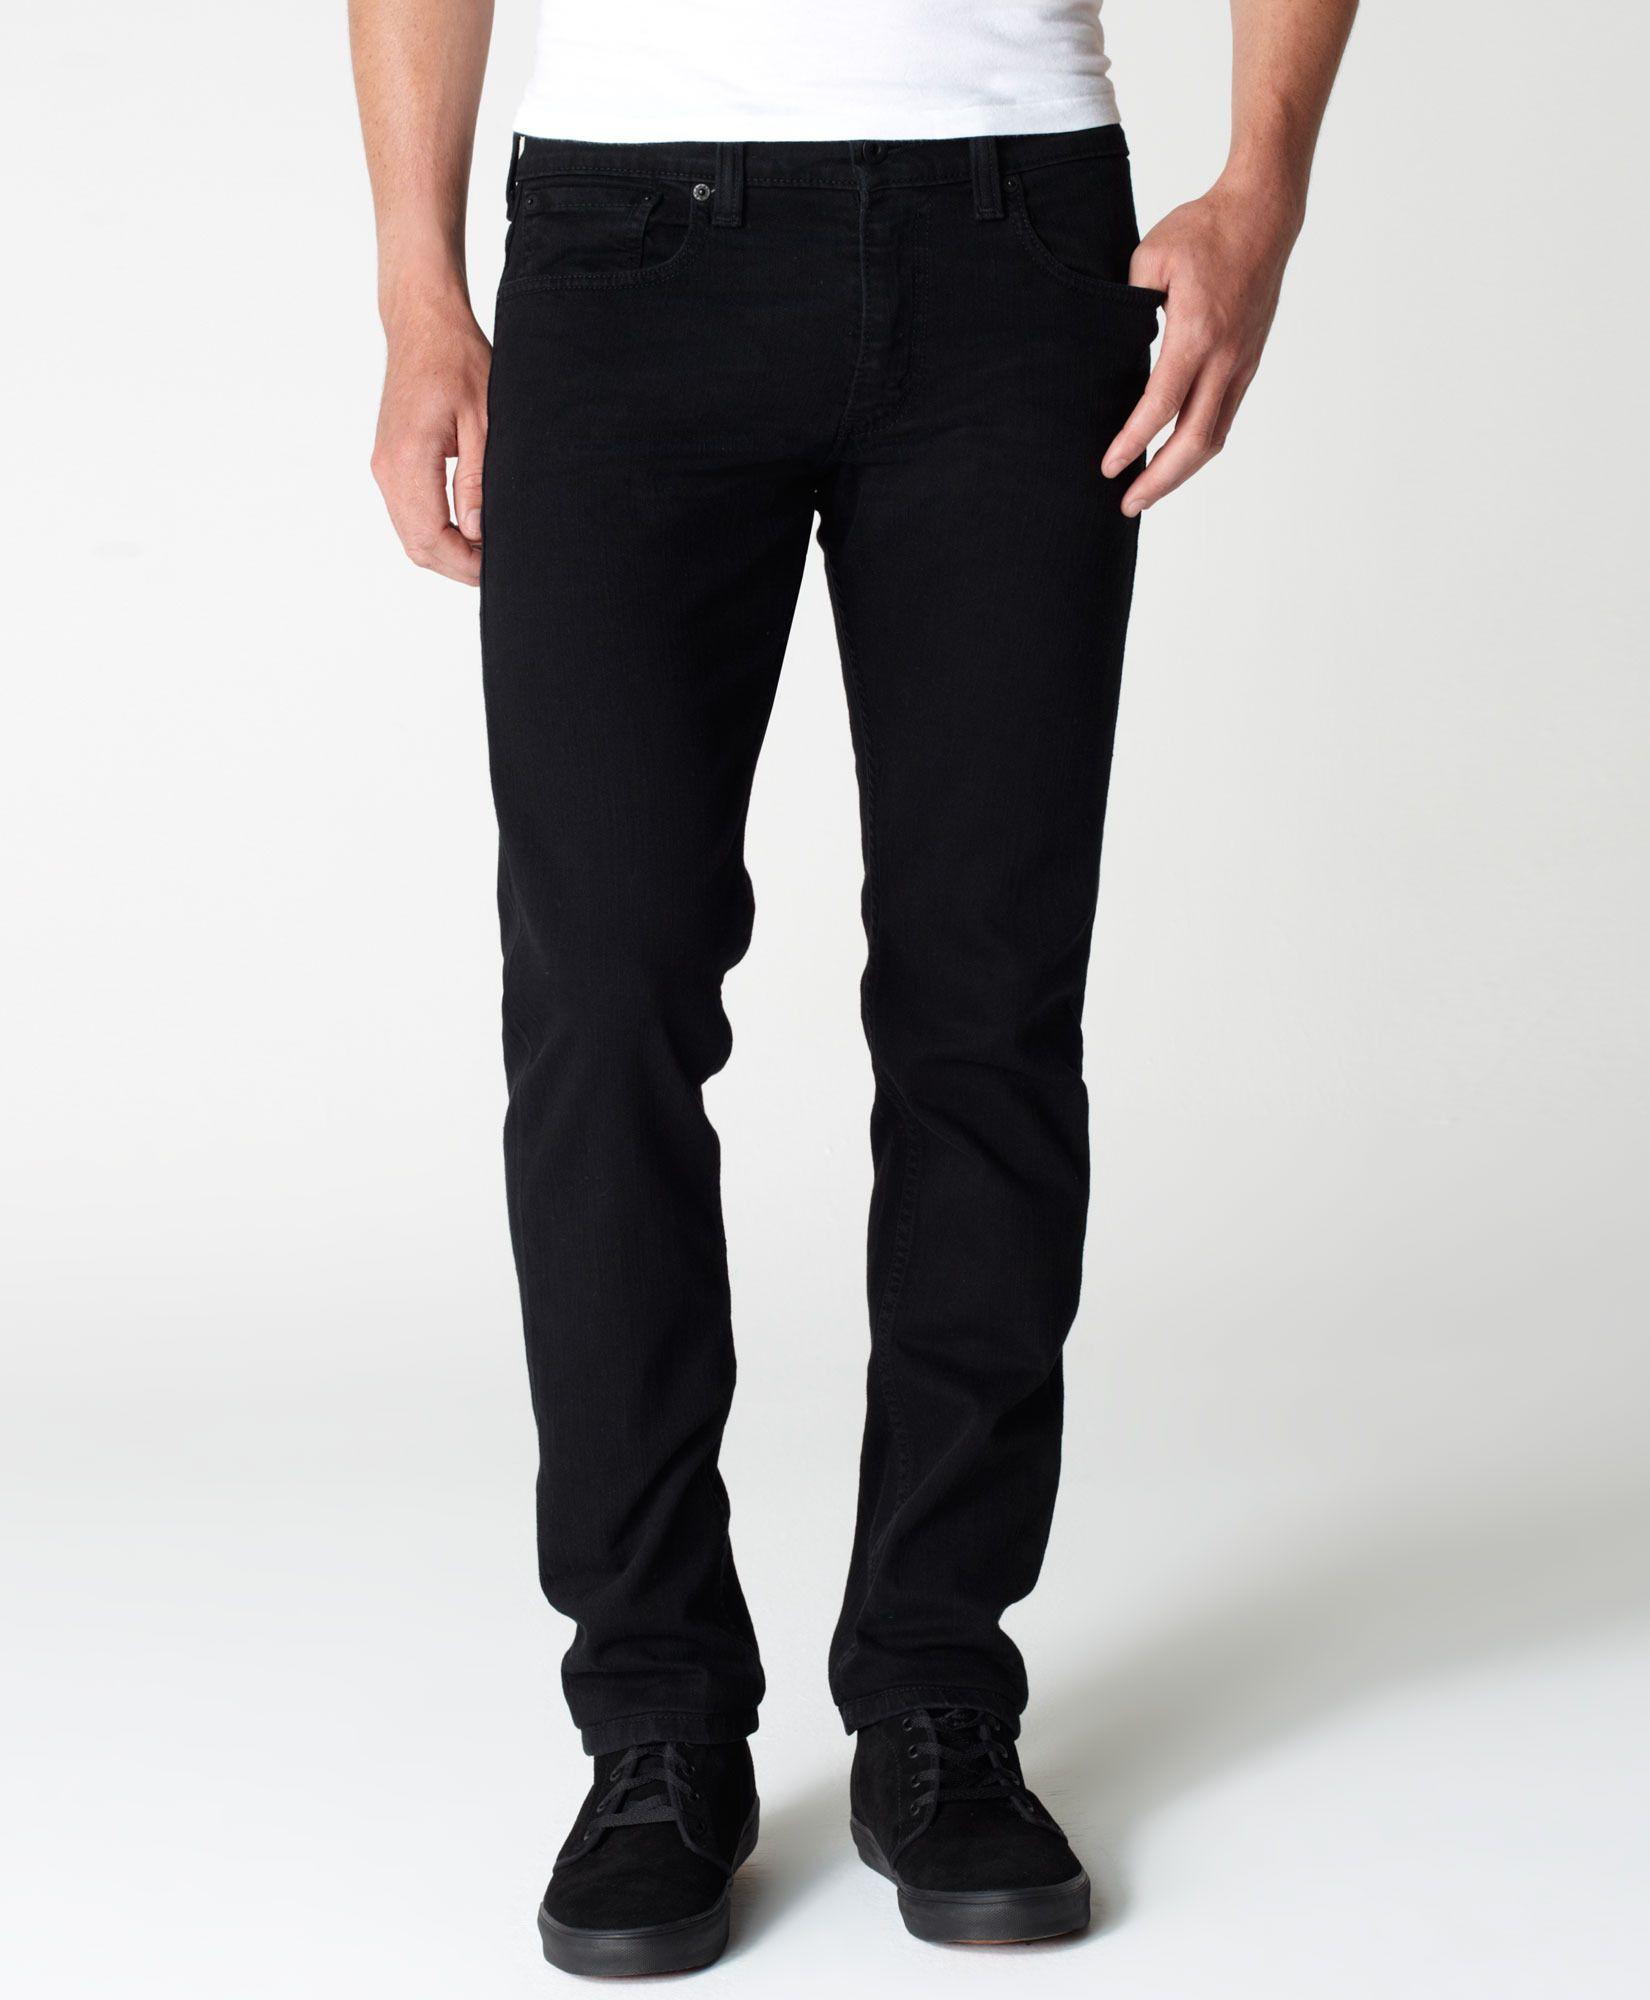 Levi S 511 Skinny Jeans Black Stretch See All Jeans Slim Fit Mens Jeans Mens Jeans Slim Shop Mens Jeans [ 2000 x 1650 Pixel ]